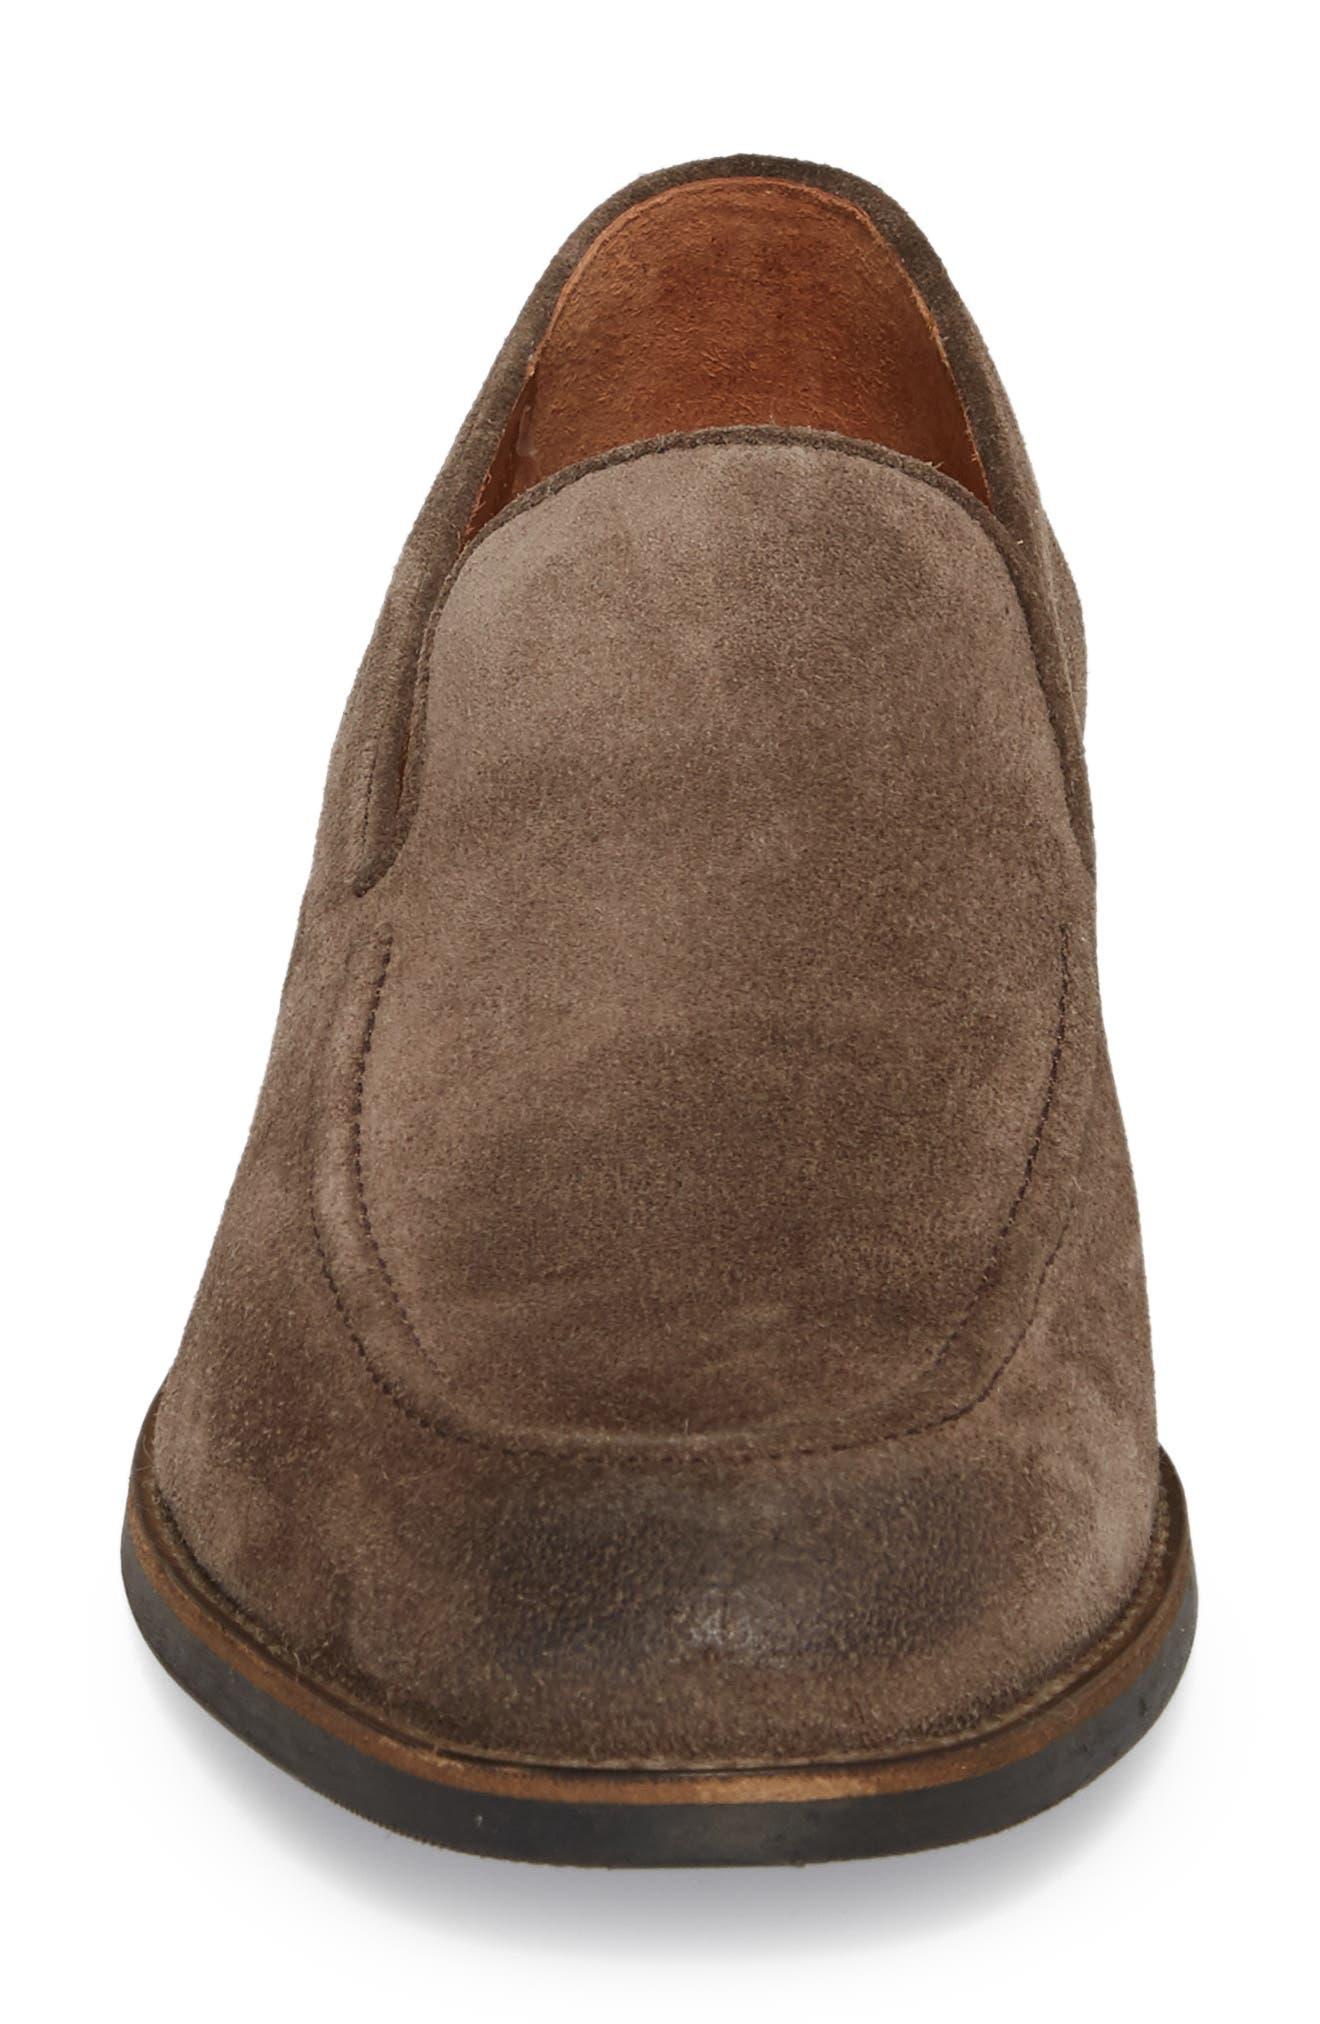 Jefferson Venetian Loafer,                             Alternate thumbnail 4, color,                             ELEPHANT SUEDE